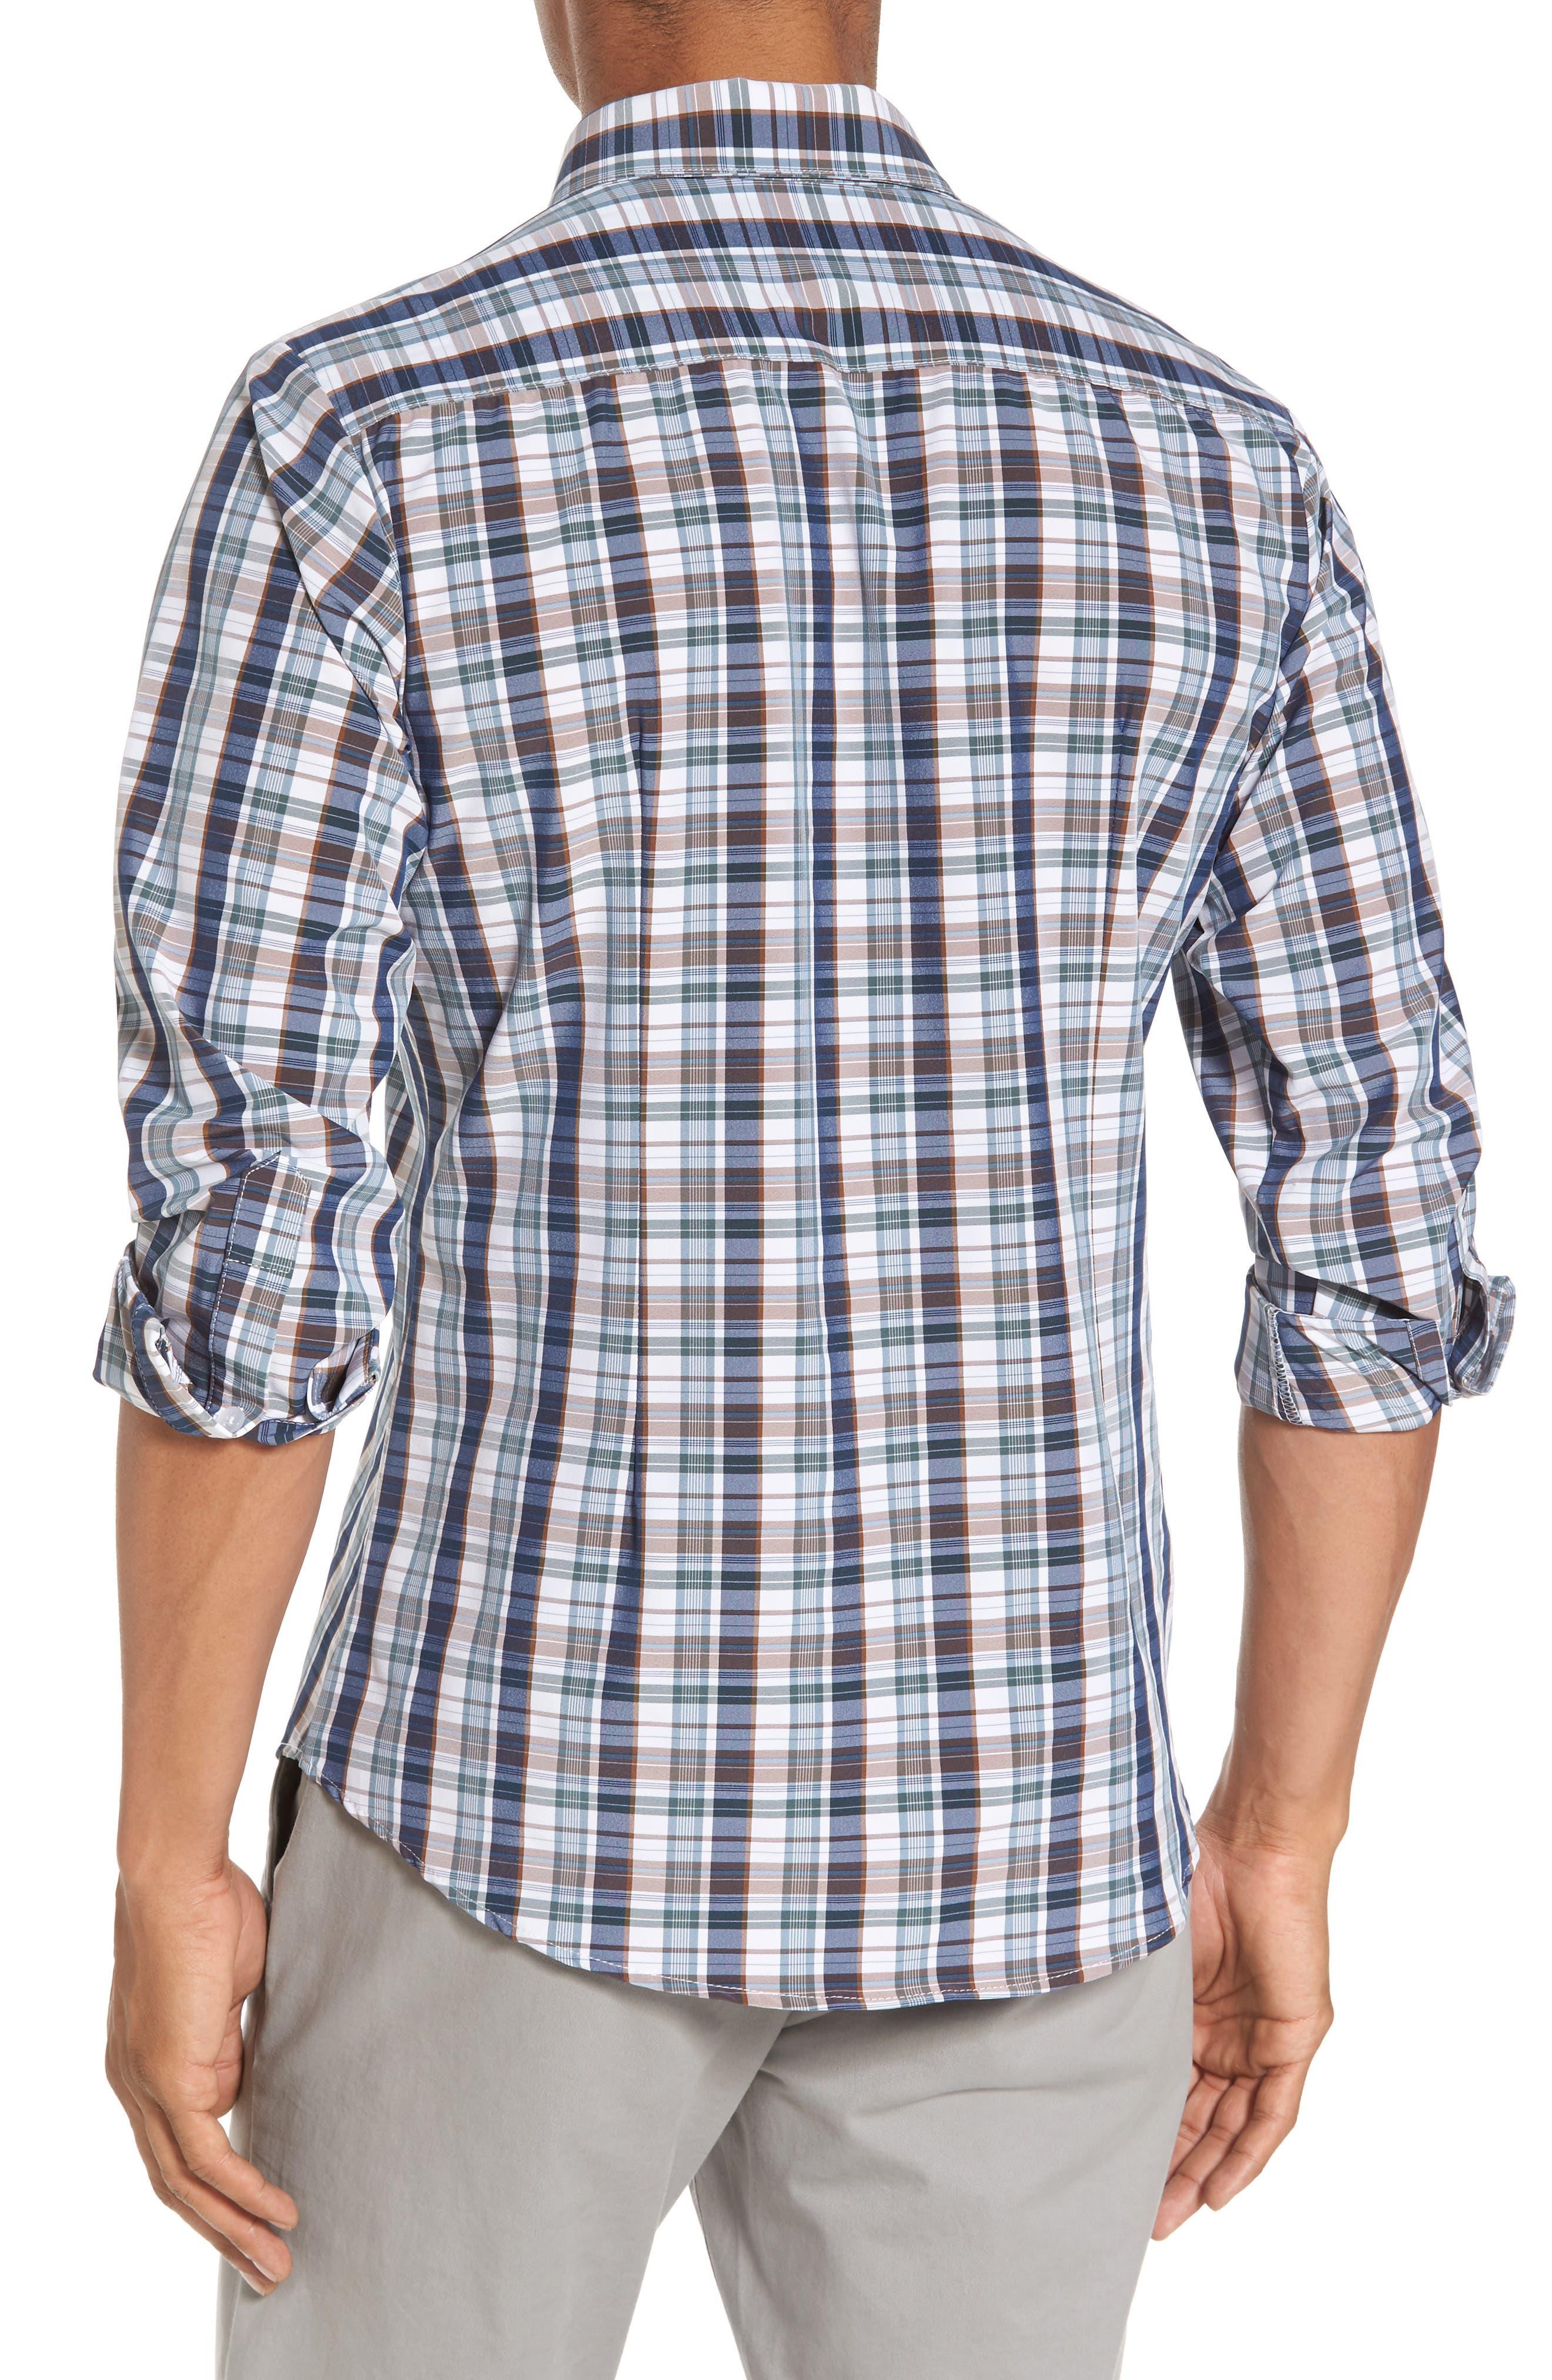 Alternate Image 2  - Mizzen+Main Russell Madras Plaid Performance Sport Shirt (Regular & Tall)